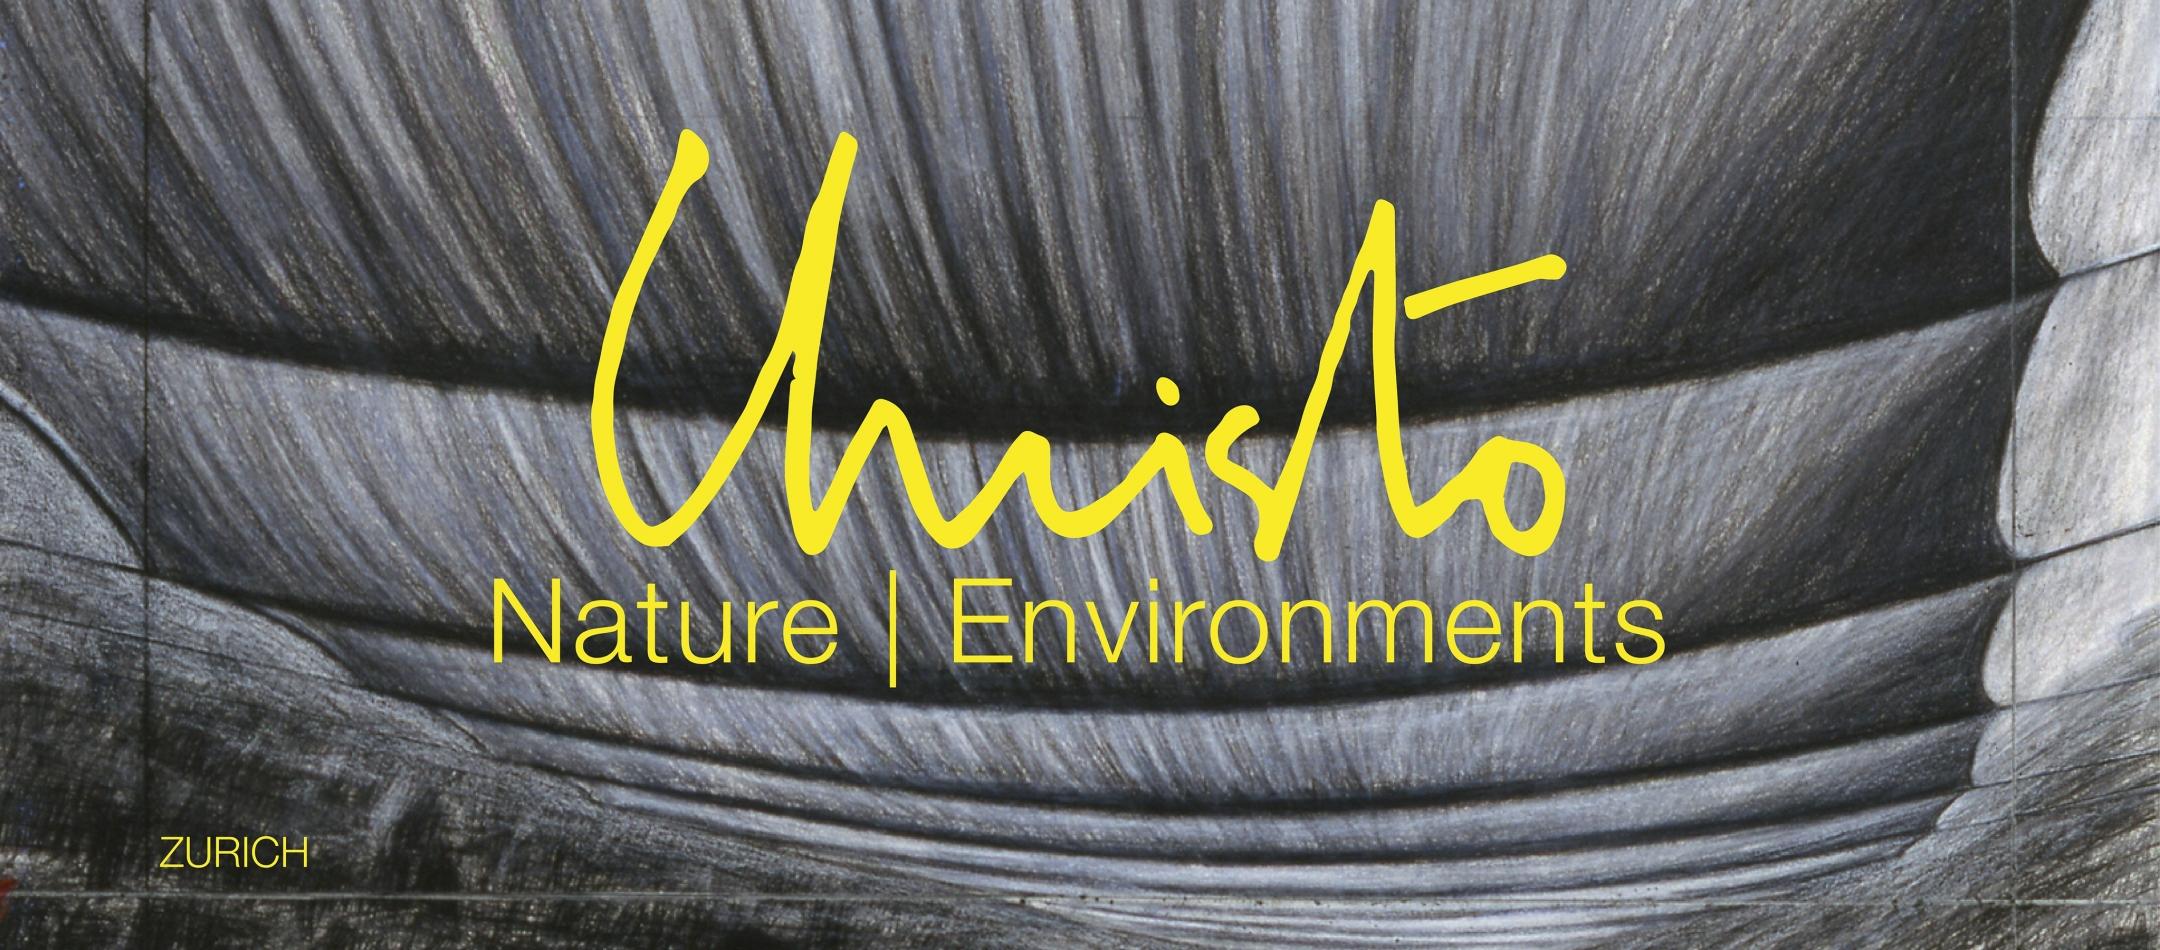 Christo, Nature | Environments